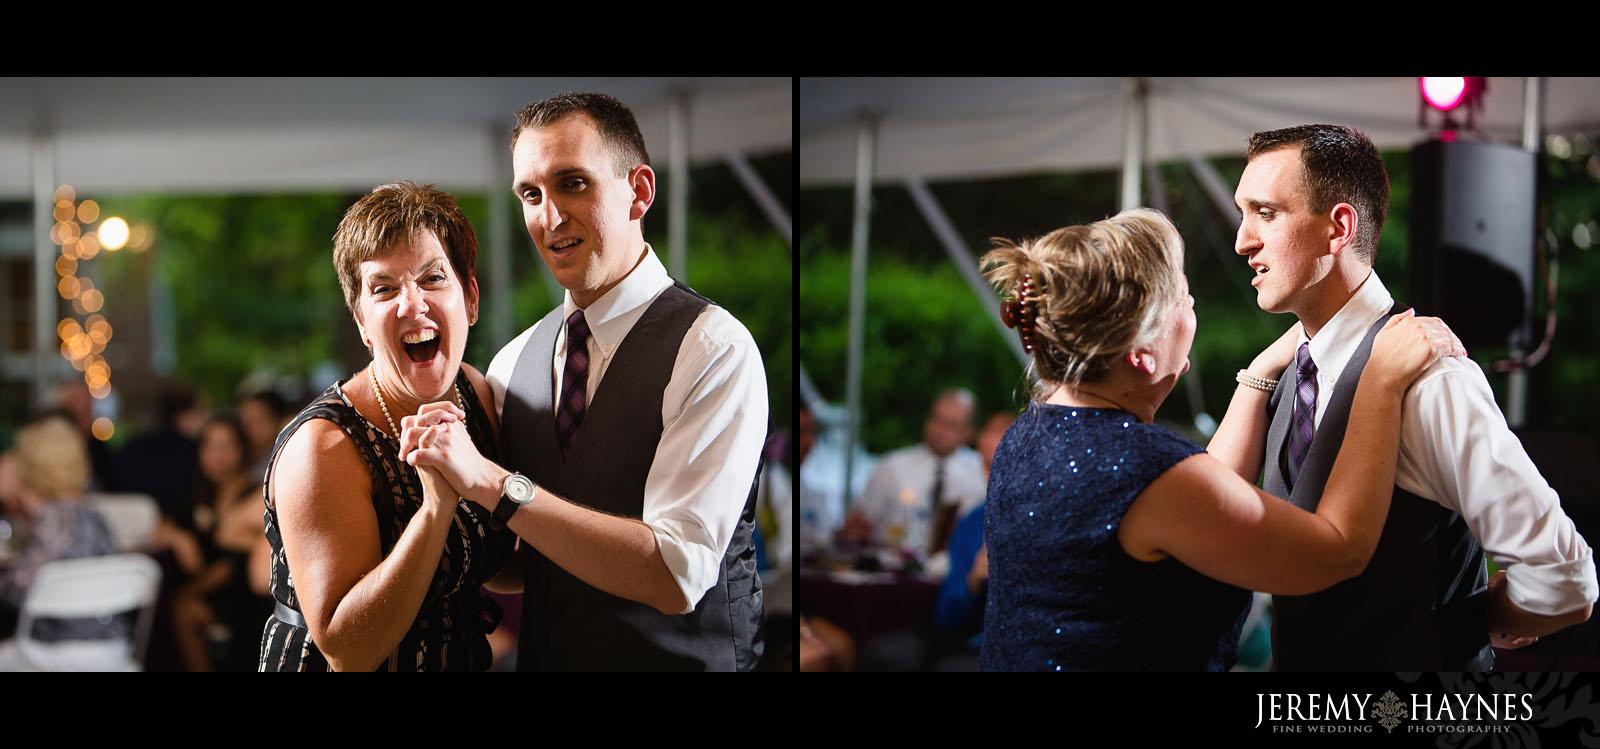 mother-son-wedding-dance-danville-wedding